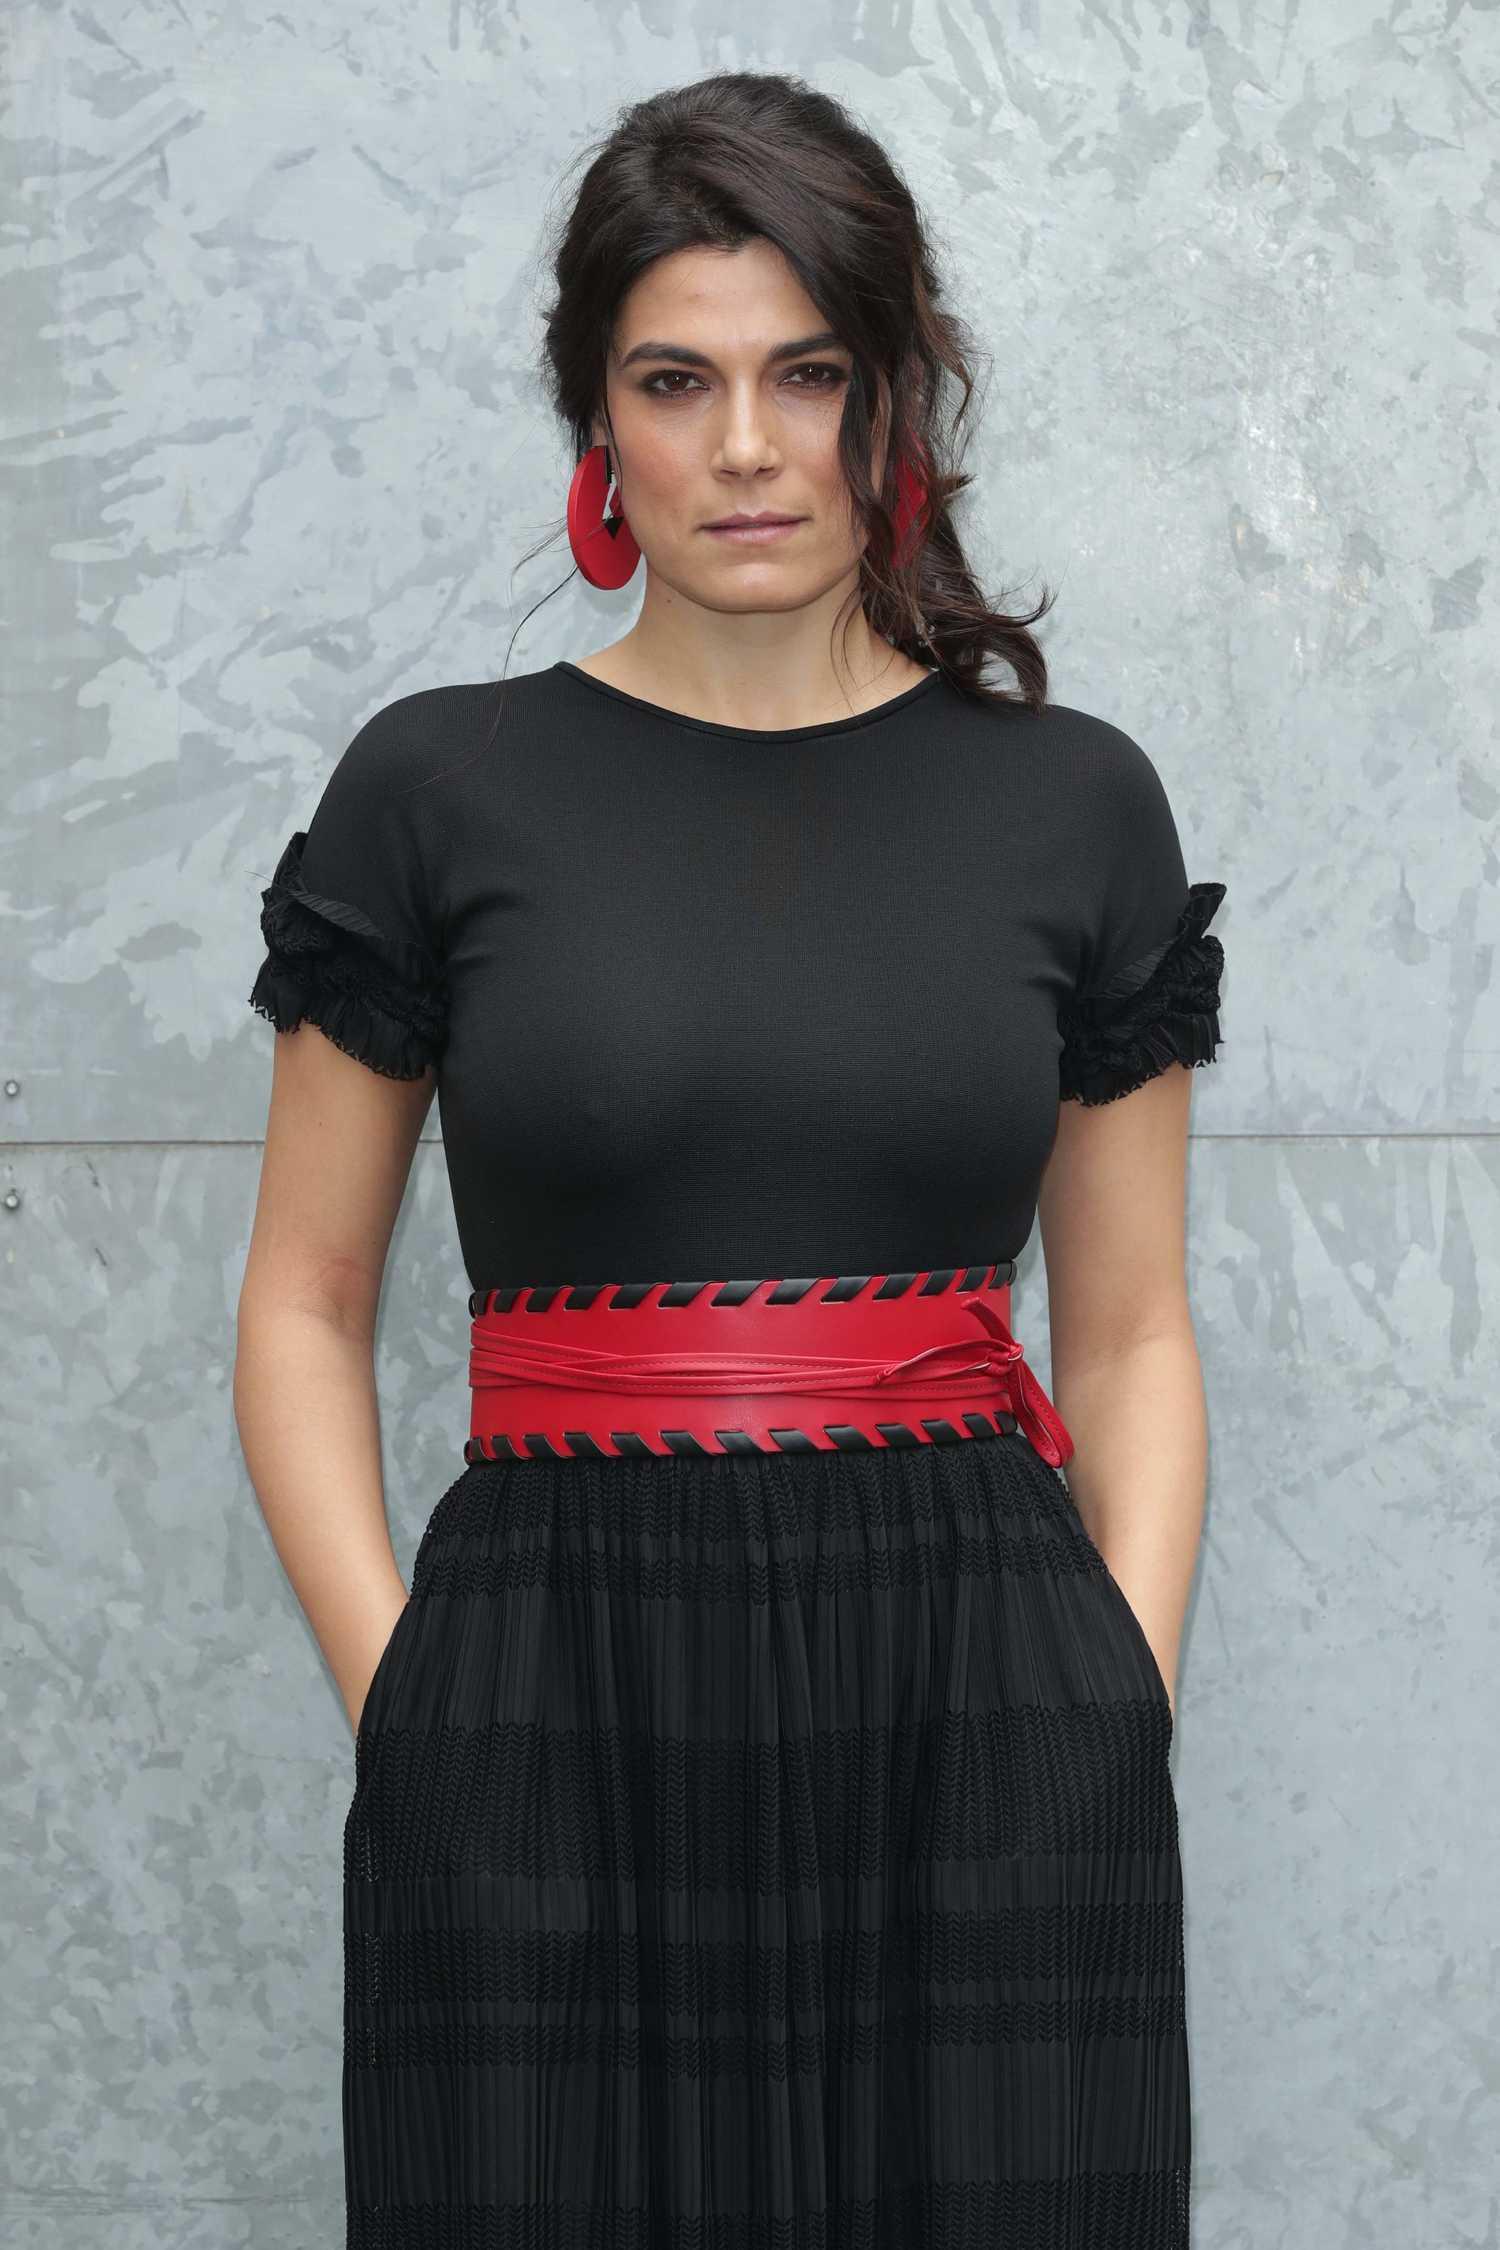 Valeria Solarino At Emporio Armani Show During The Milan